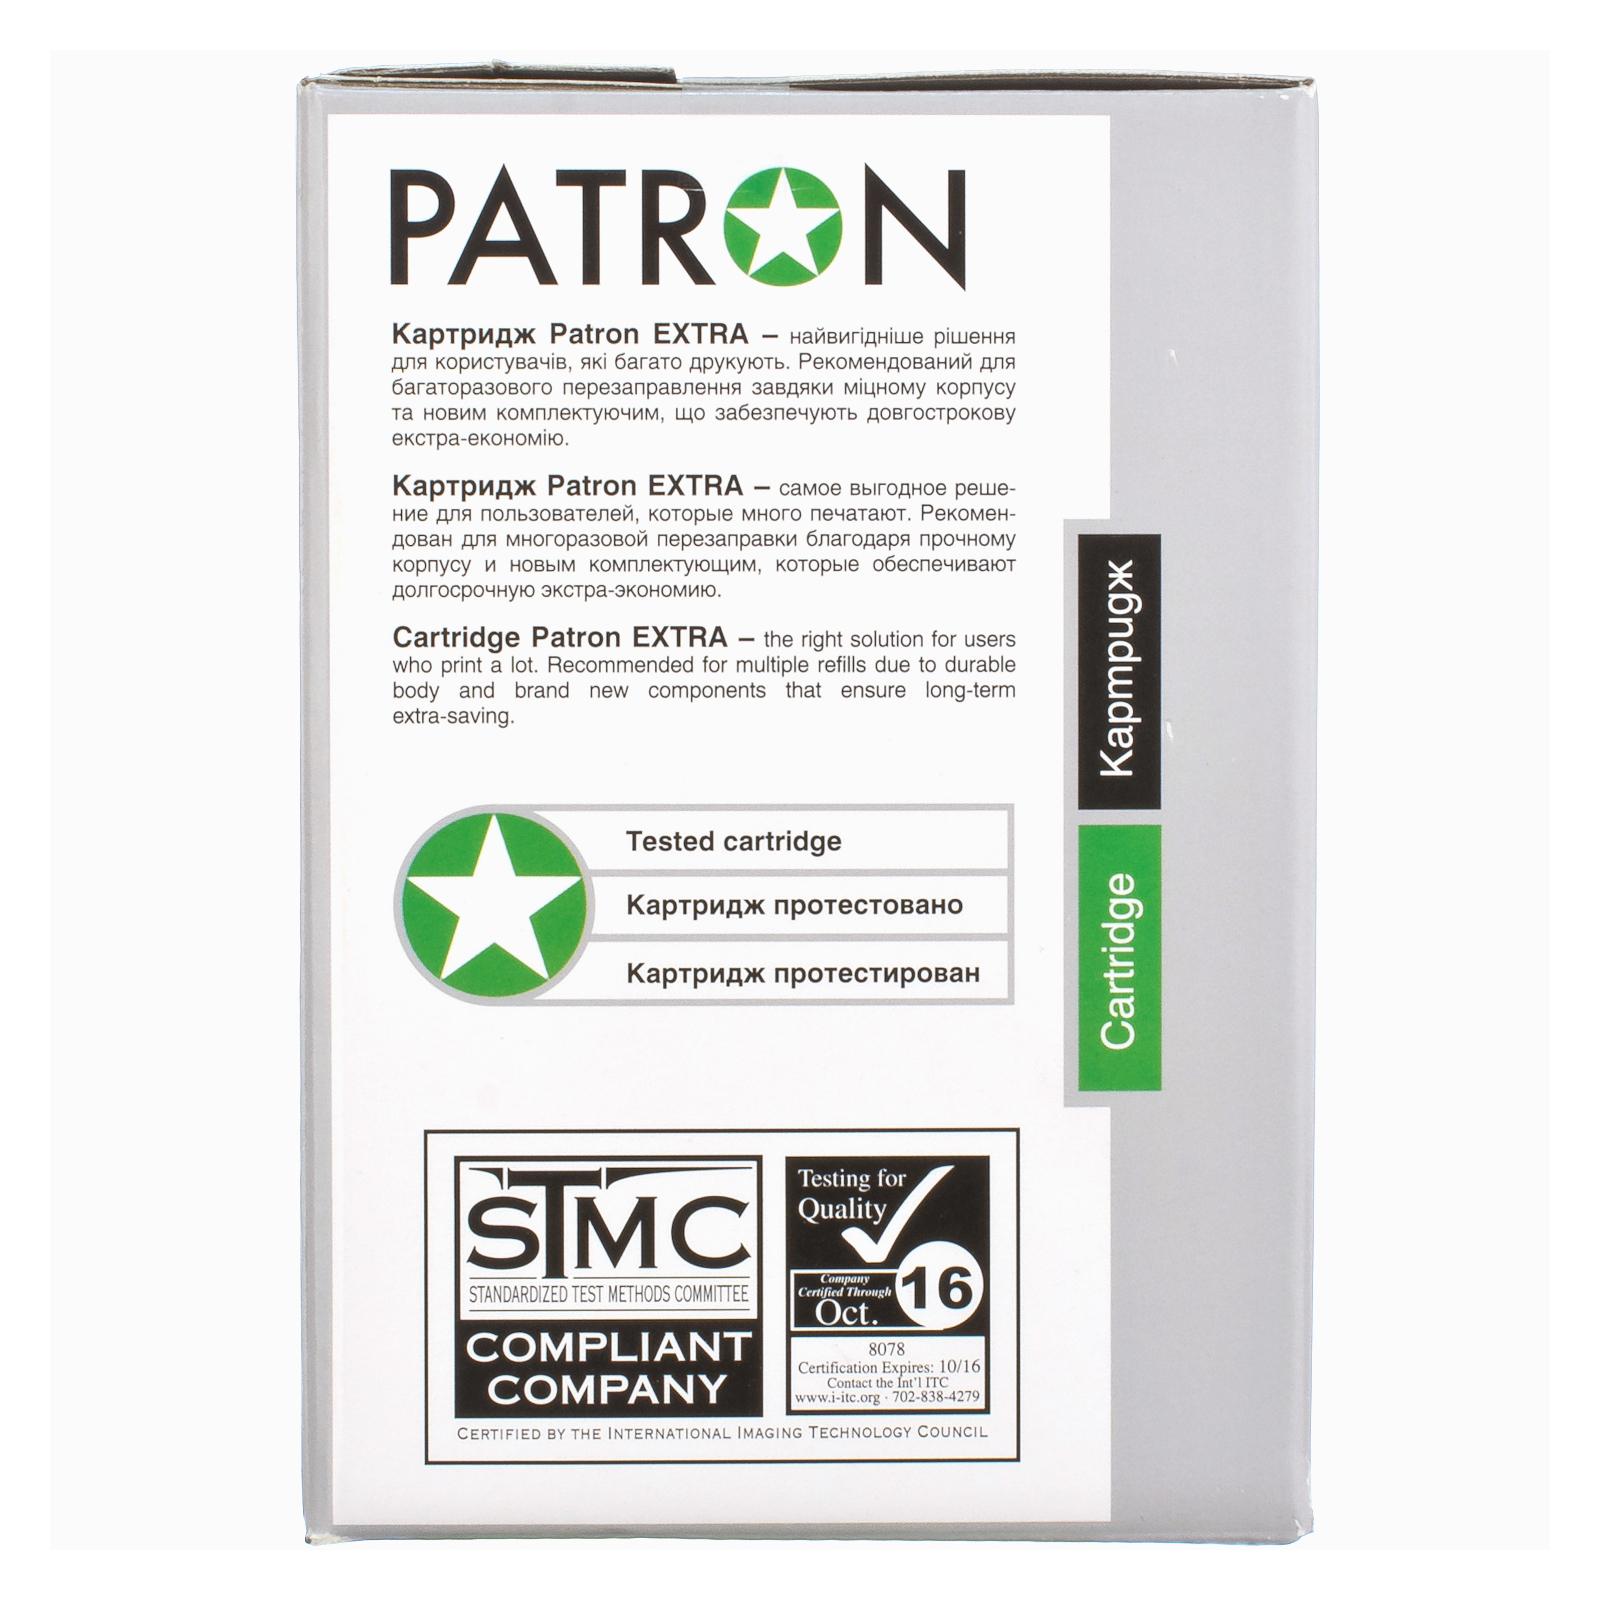 Картридж PATRON HP CLJ CP1215/ CP1515 (PN-125AKR) BLACK Extra (CT-HP-CB540A-B-PN-R) изображение 6